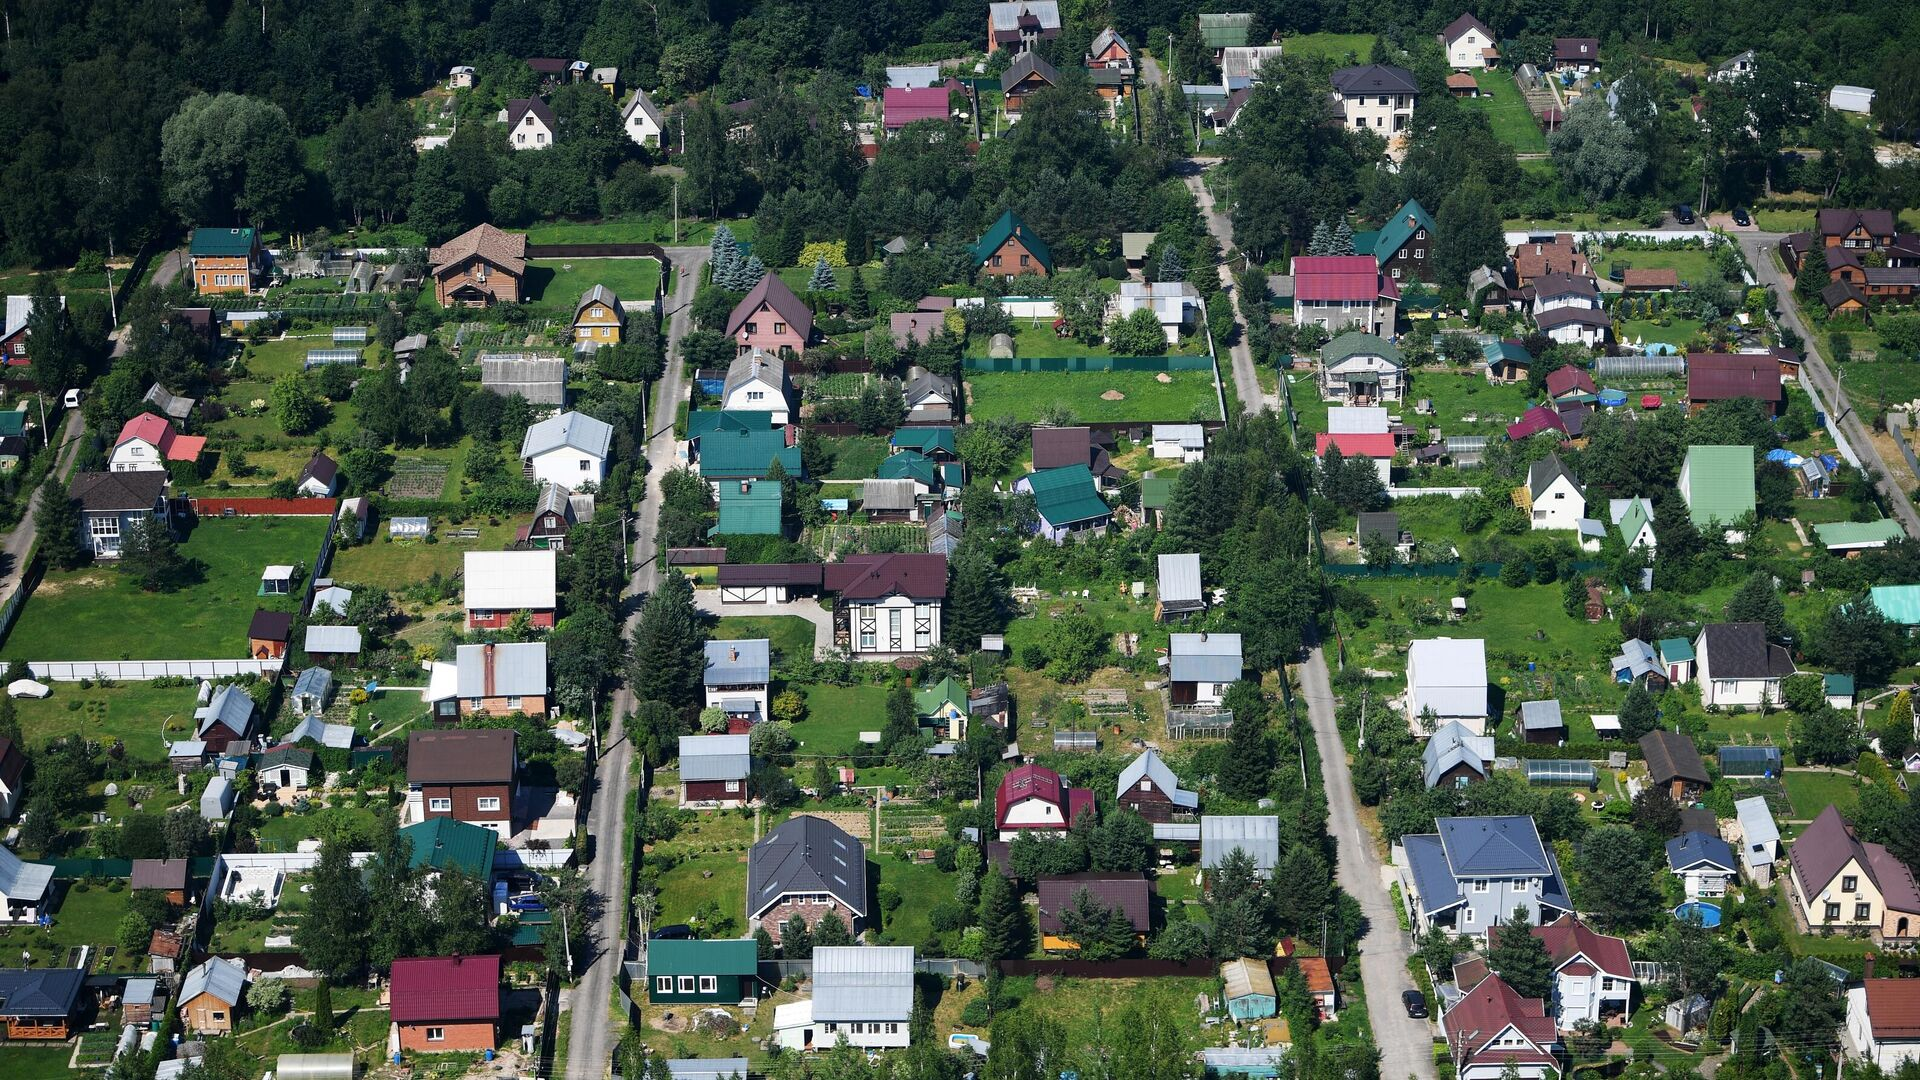 Вид на дома в садовом товариществе - РИА Новости, 1920, 09.07.2021